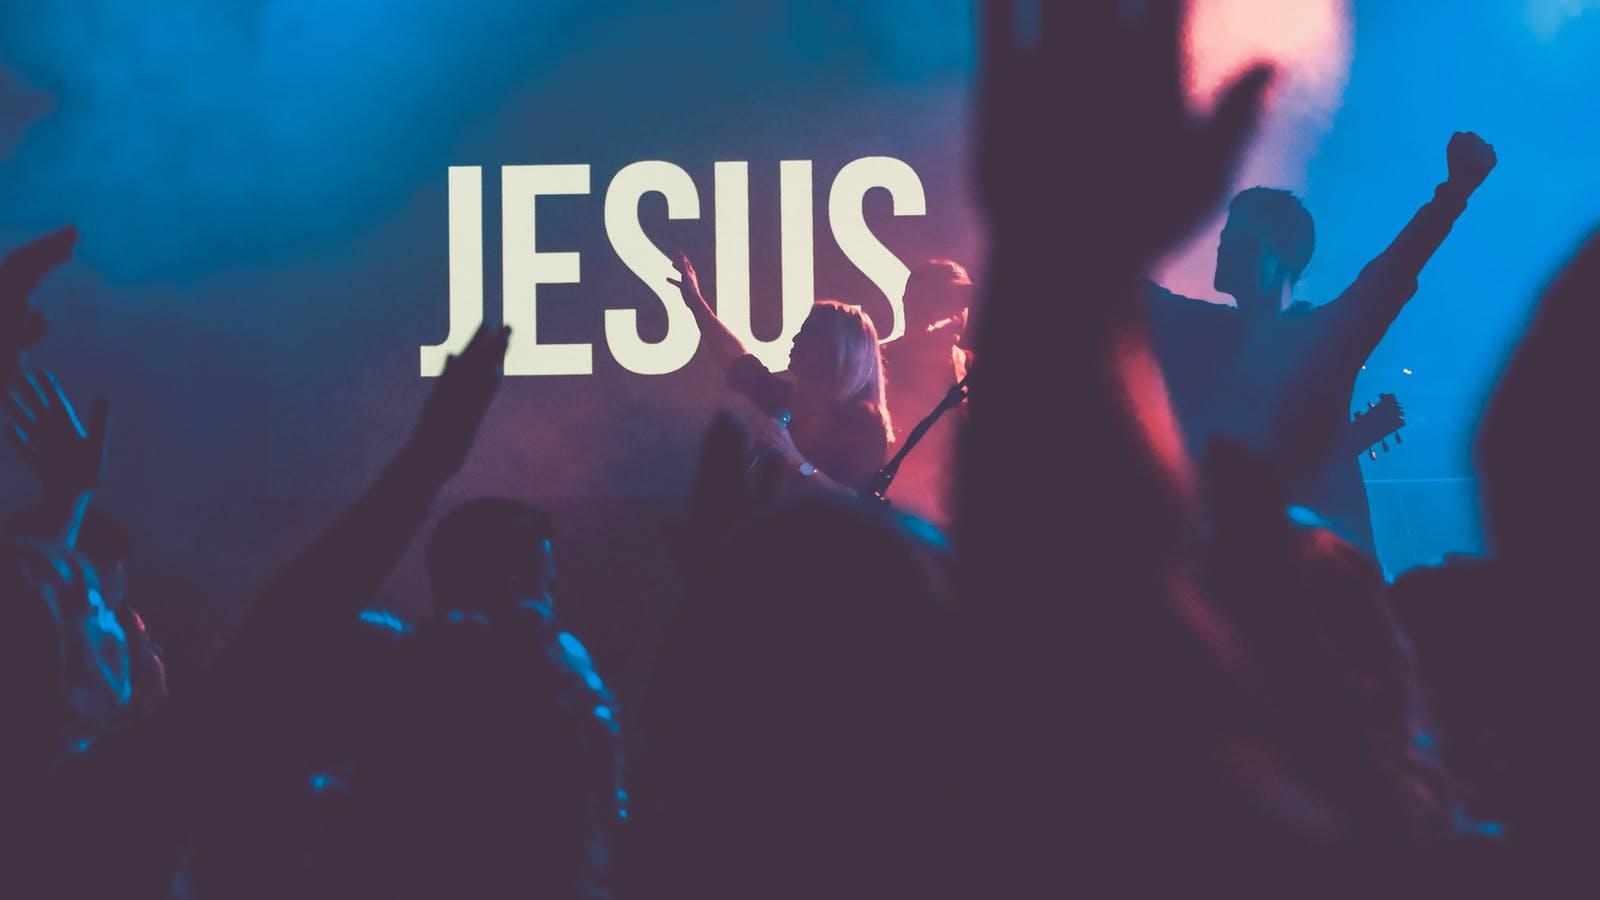 ¿Estamos adorando al Dios verdadero o estamos adorando otra cosa?